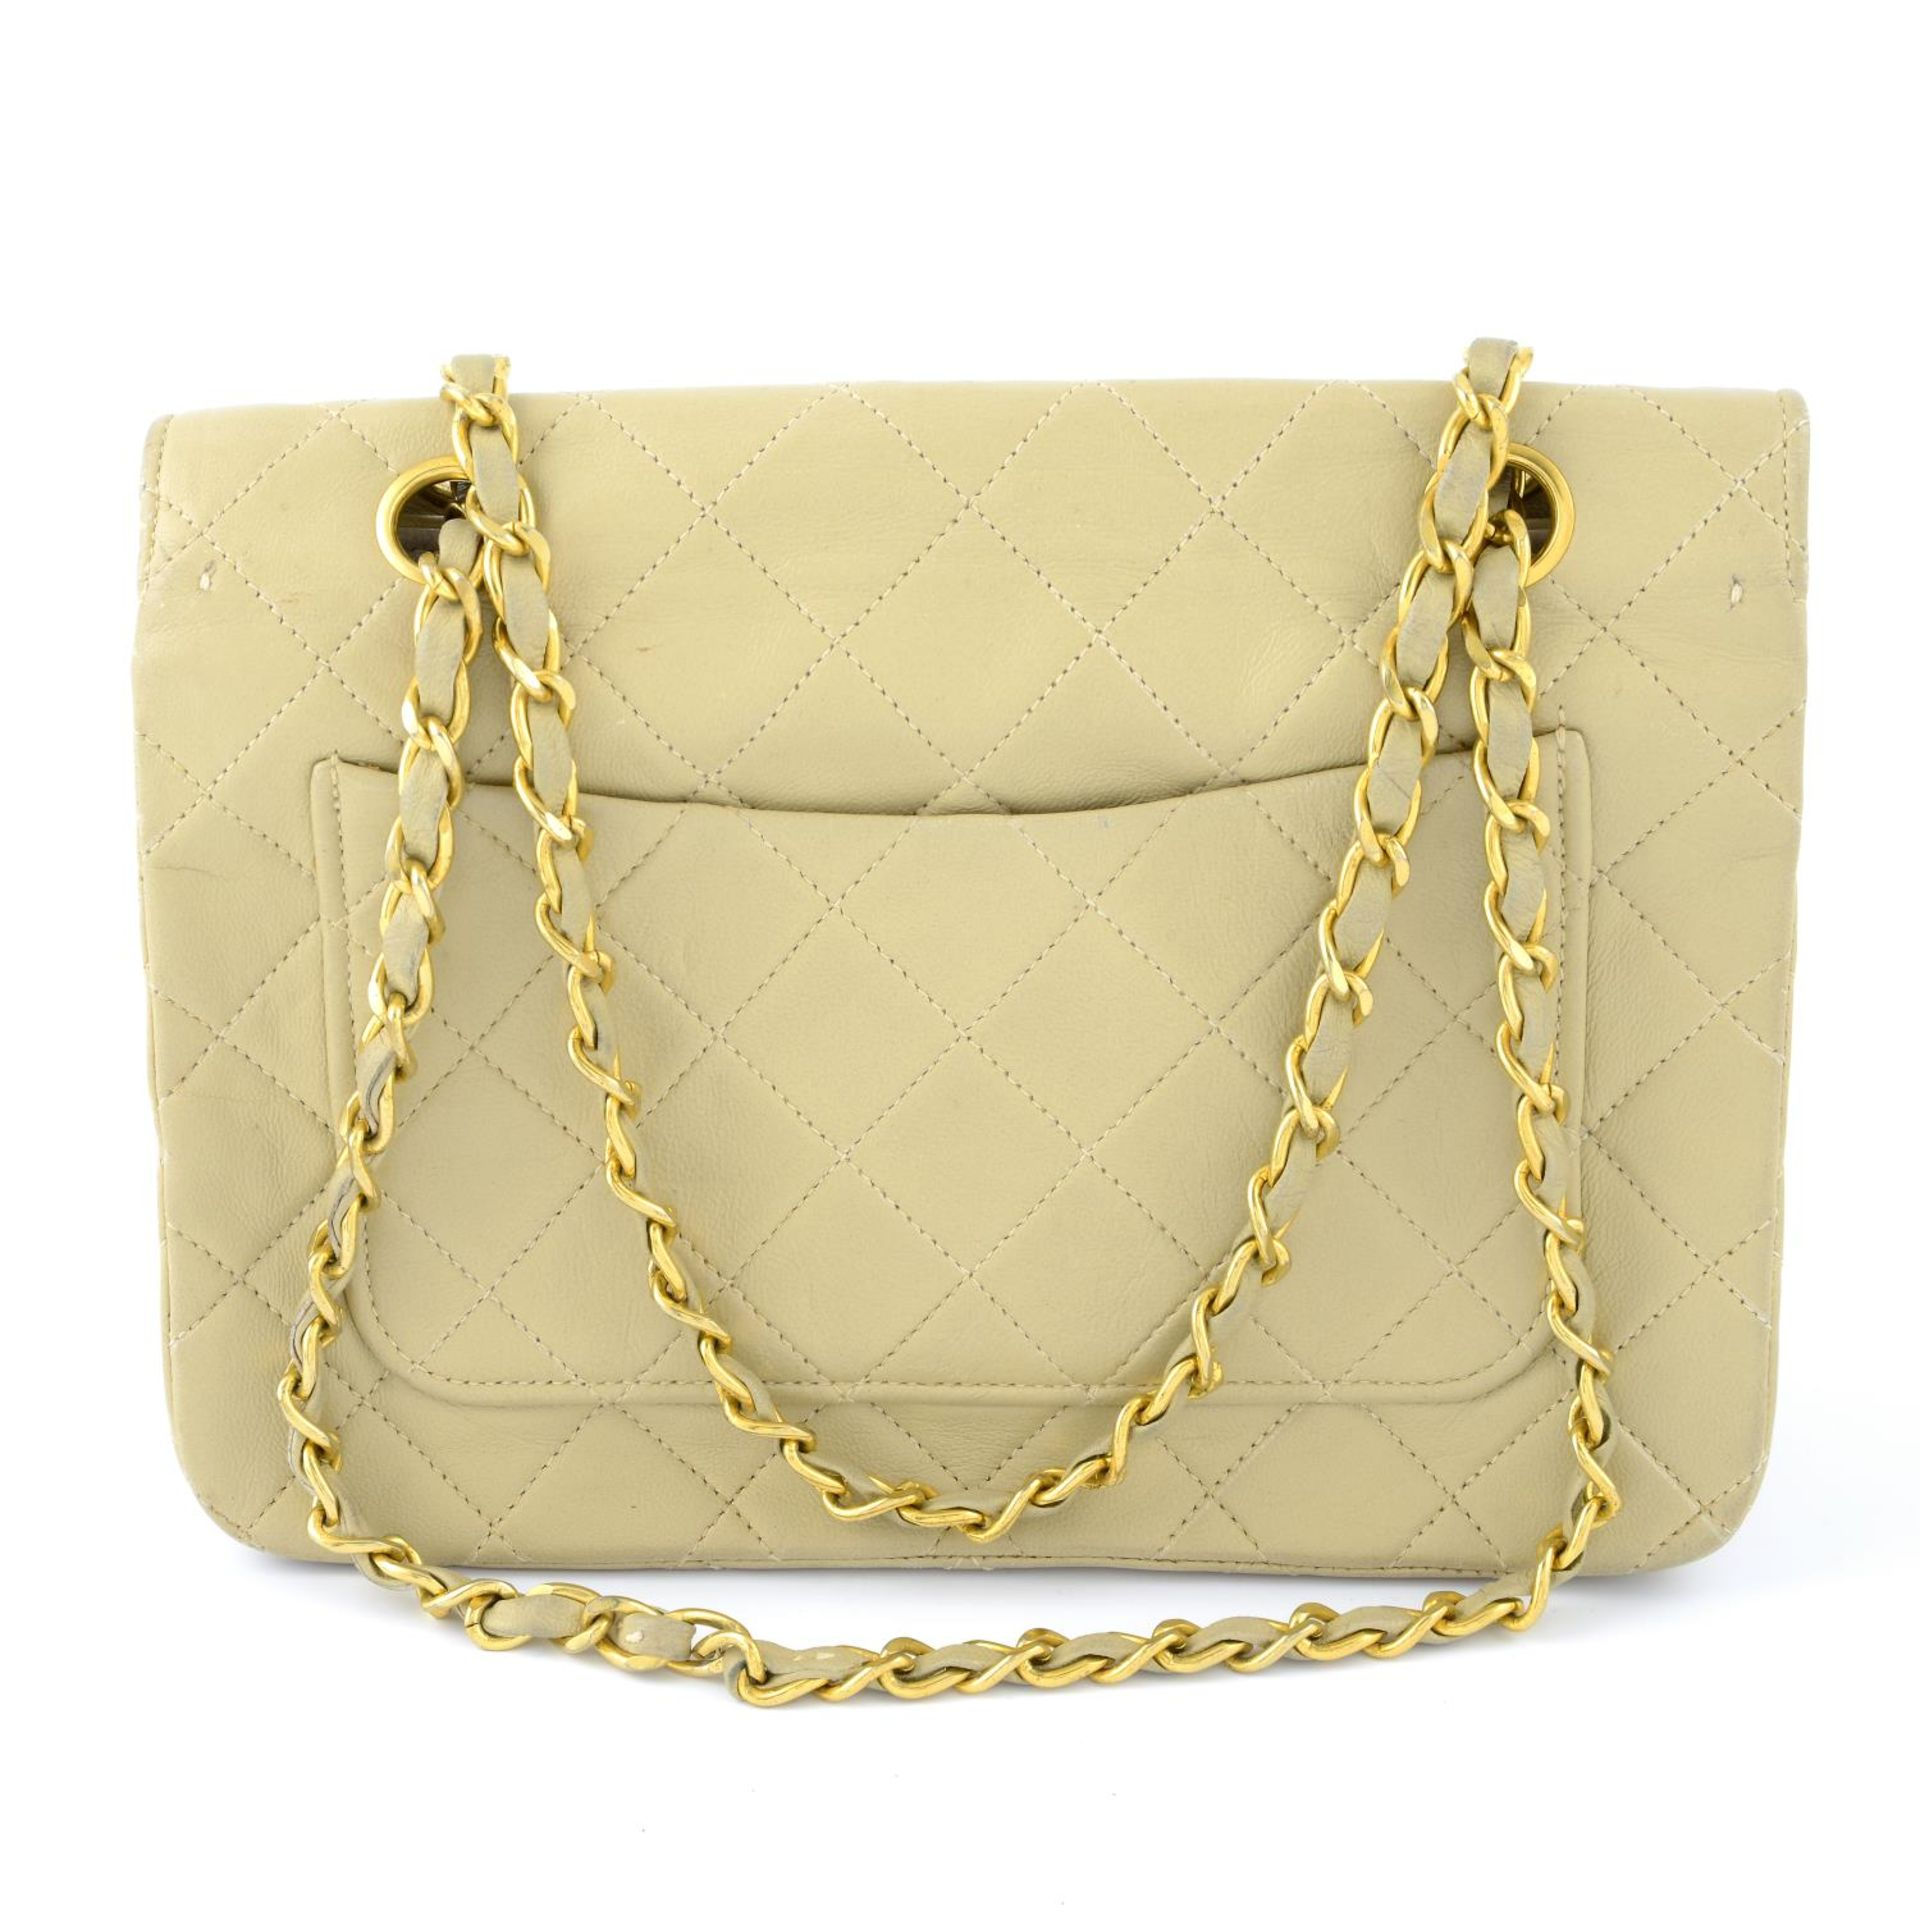 CHANEL - a nude vintage single flap handbag. - Image 2 of 5